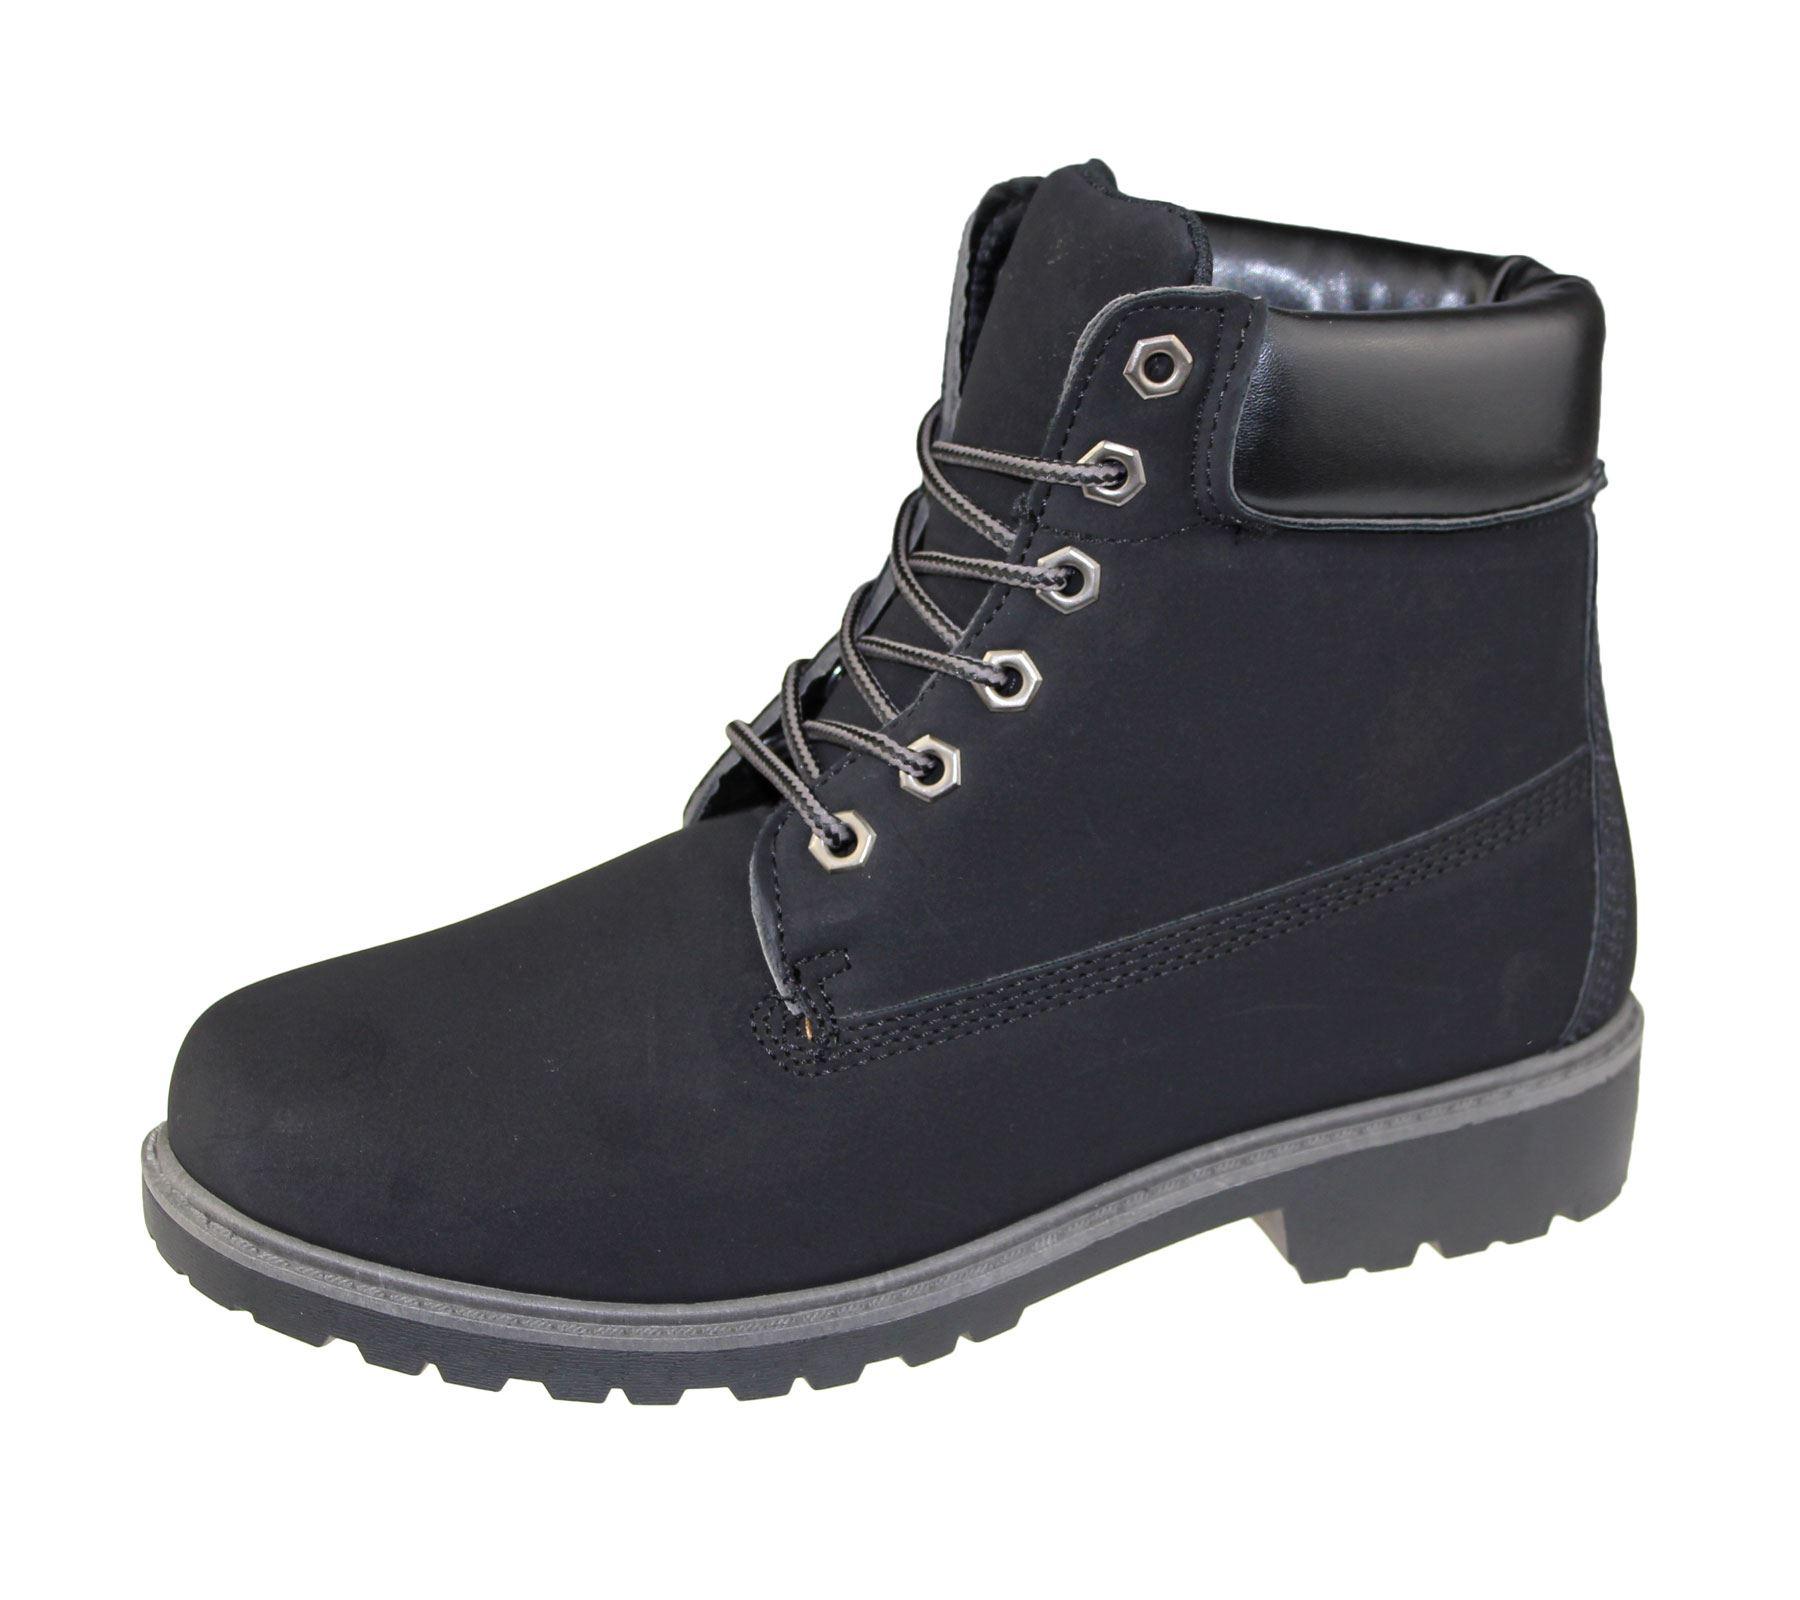 womens high top boots hiking desert trail combat